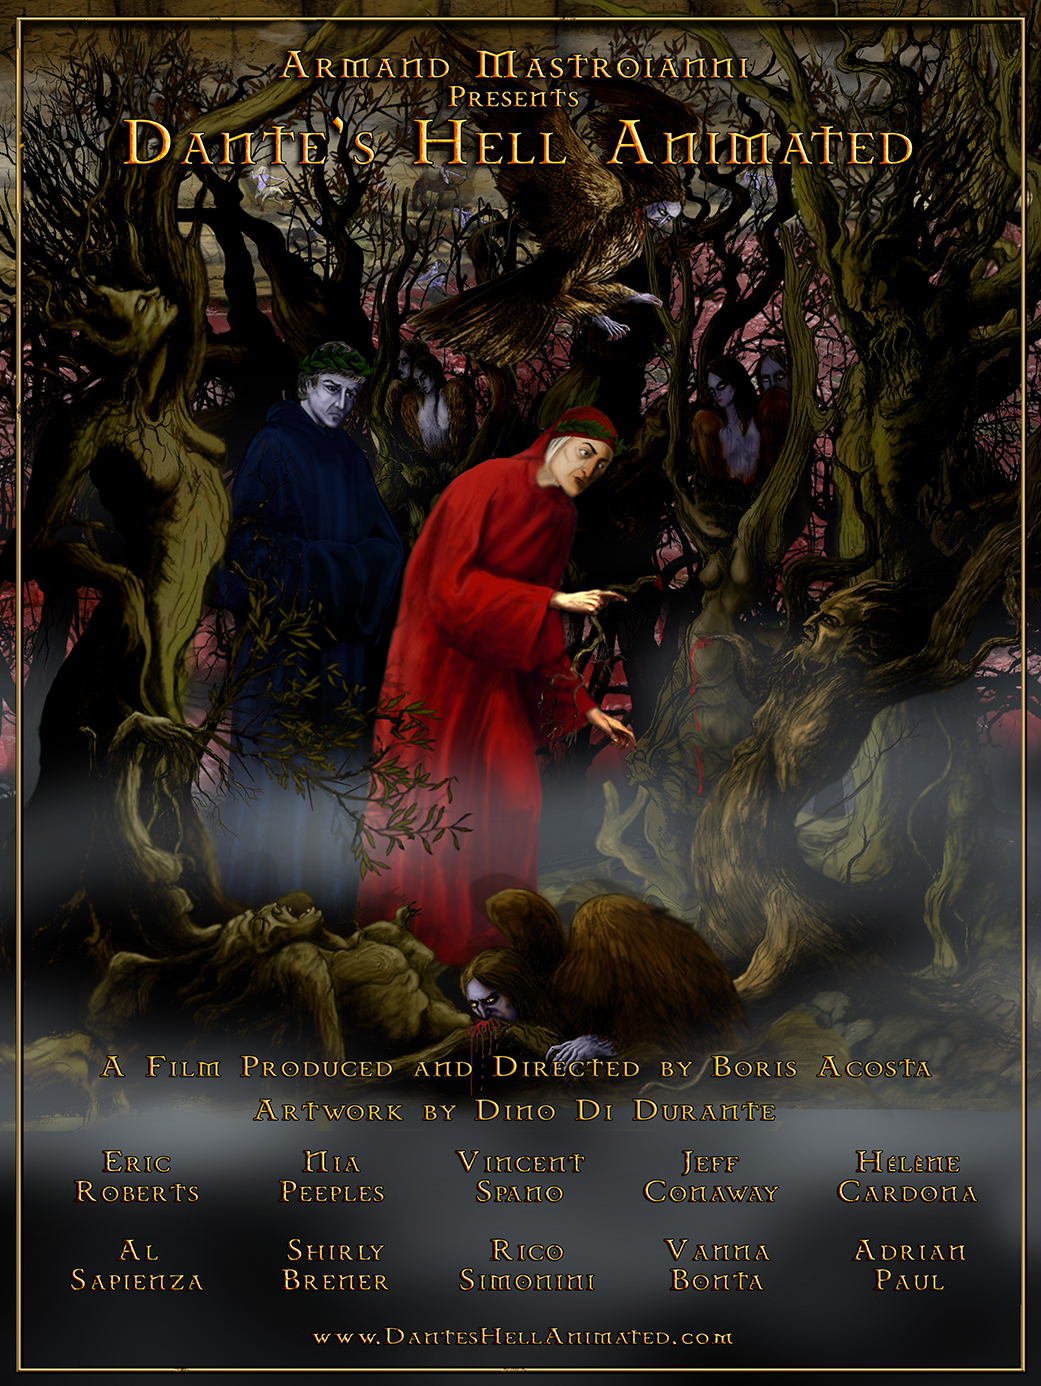 دانلود زیرنویس فارسی فیلم Dante's Hell Animated